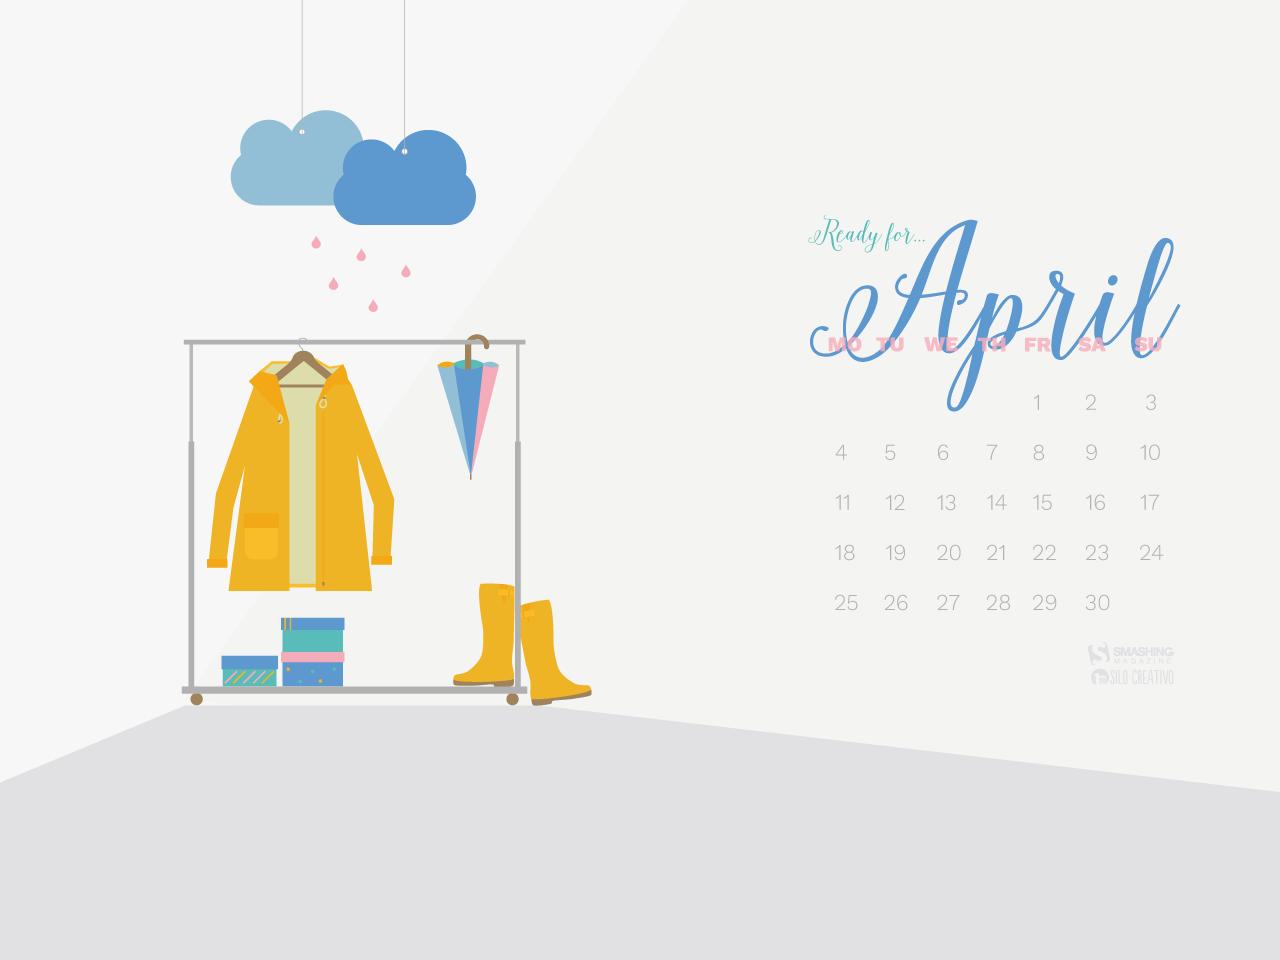 Desktop Wallpaper Calendars April 2016 Smashing Magazine 1280x960